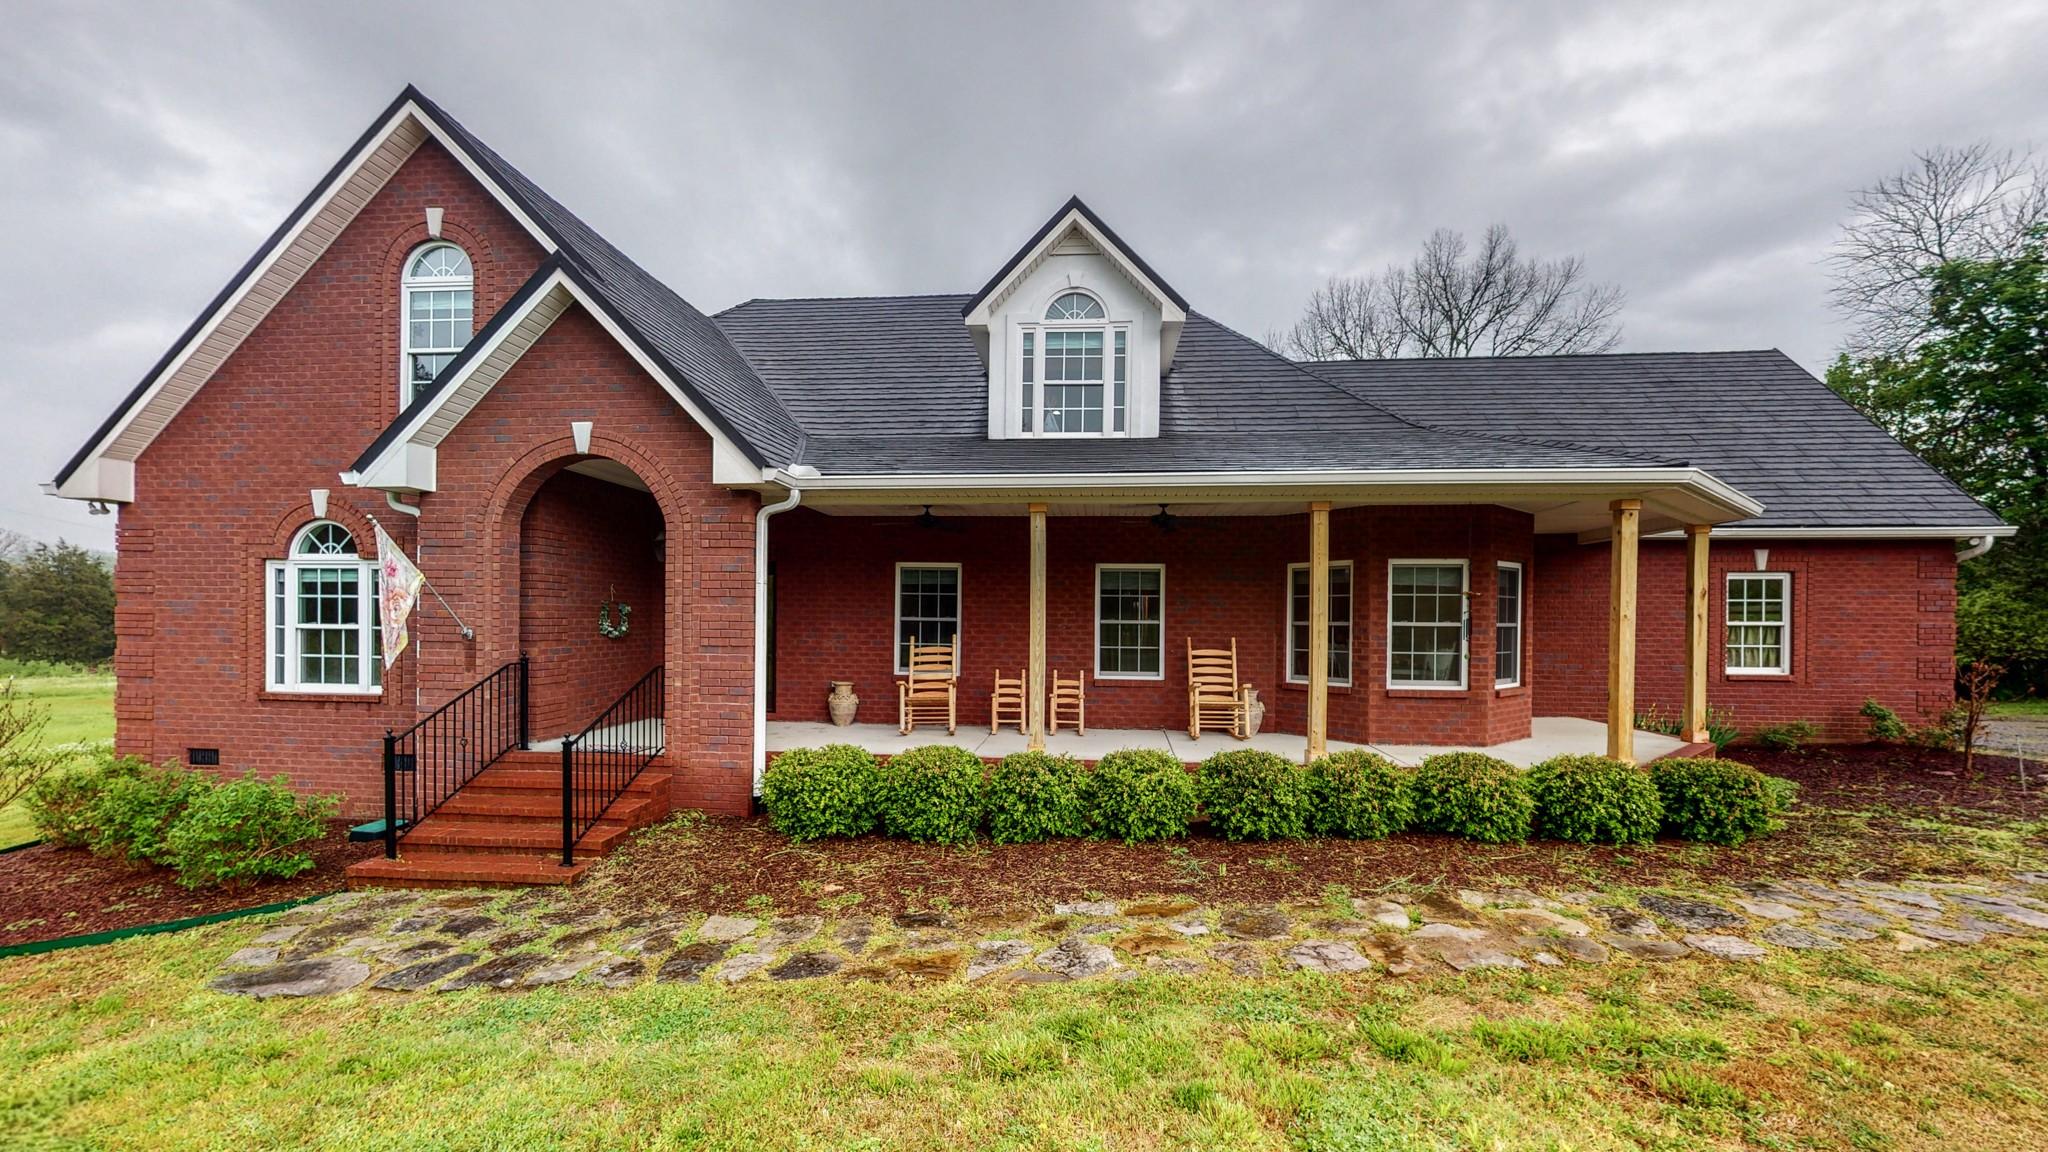 305 W Main St Property Photo - Auburntown, TN real estate listing